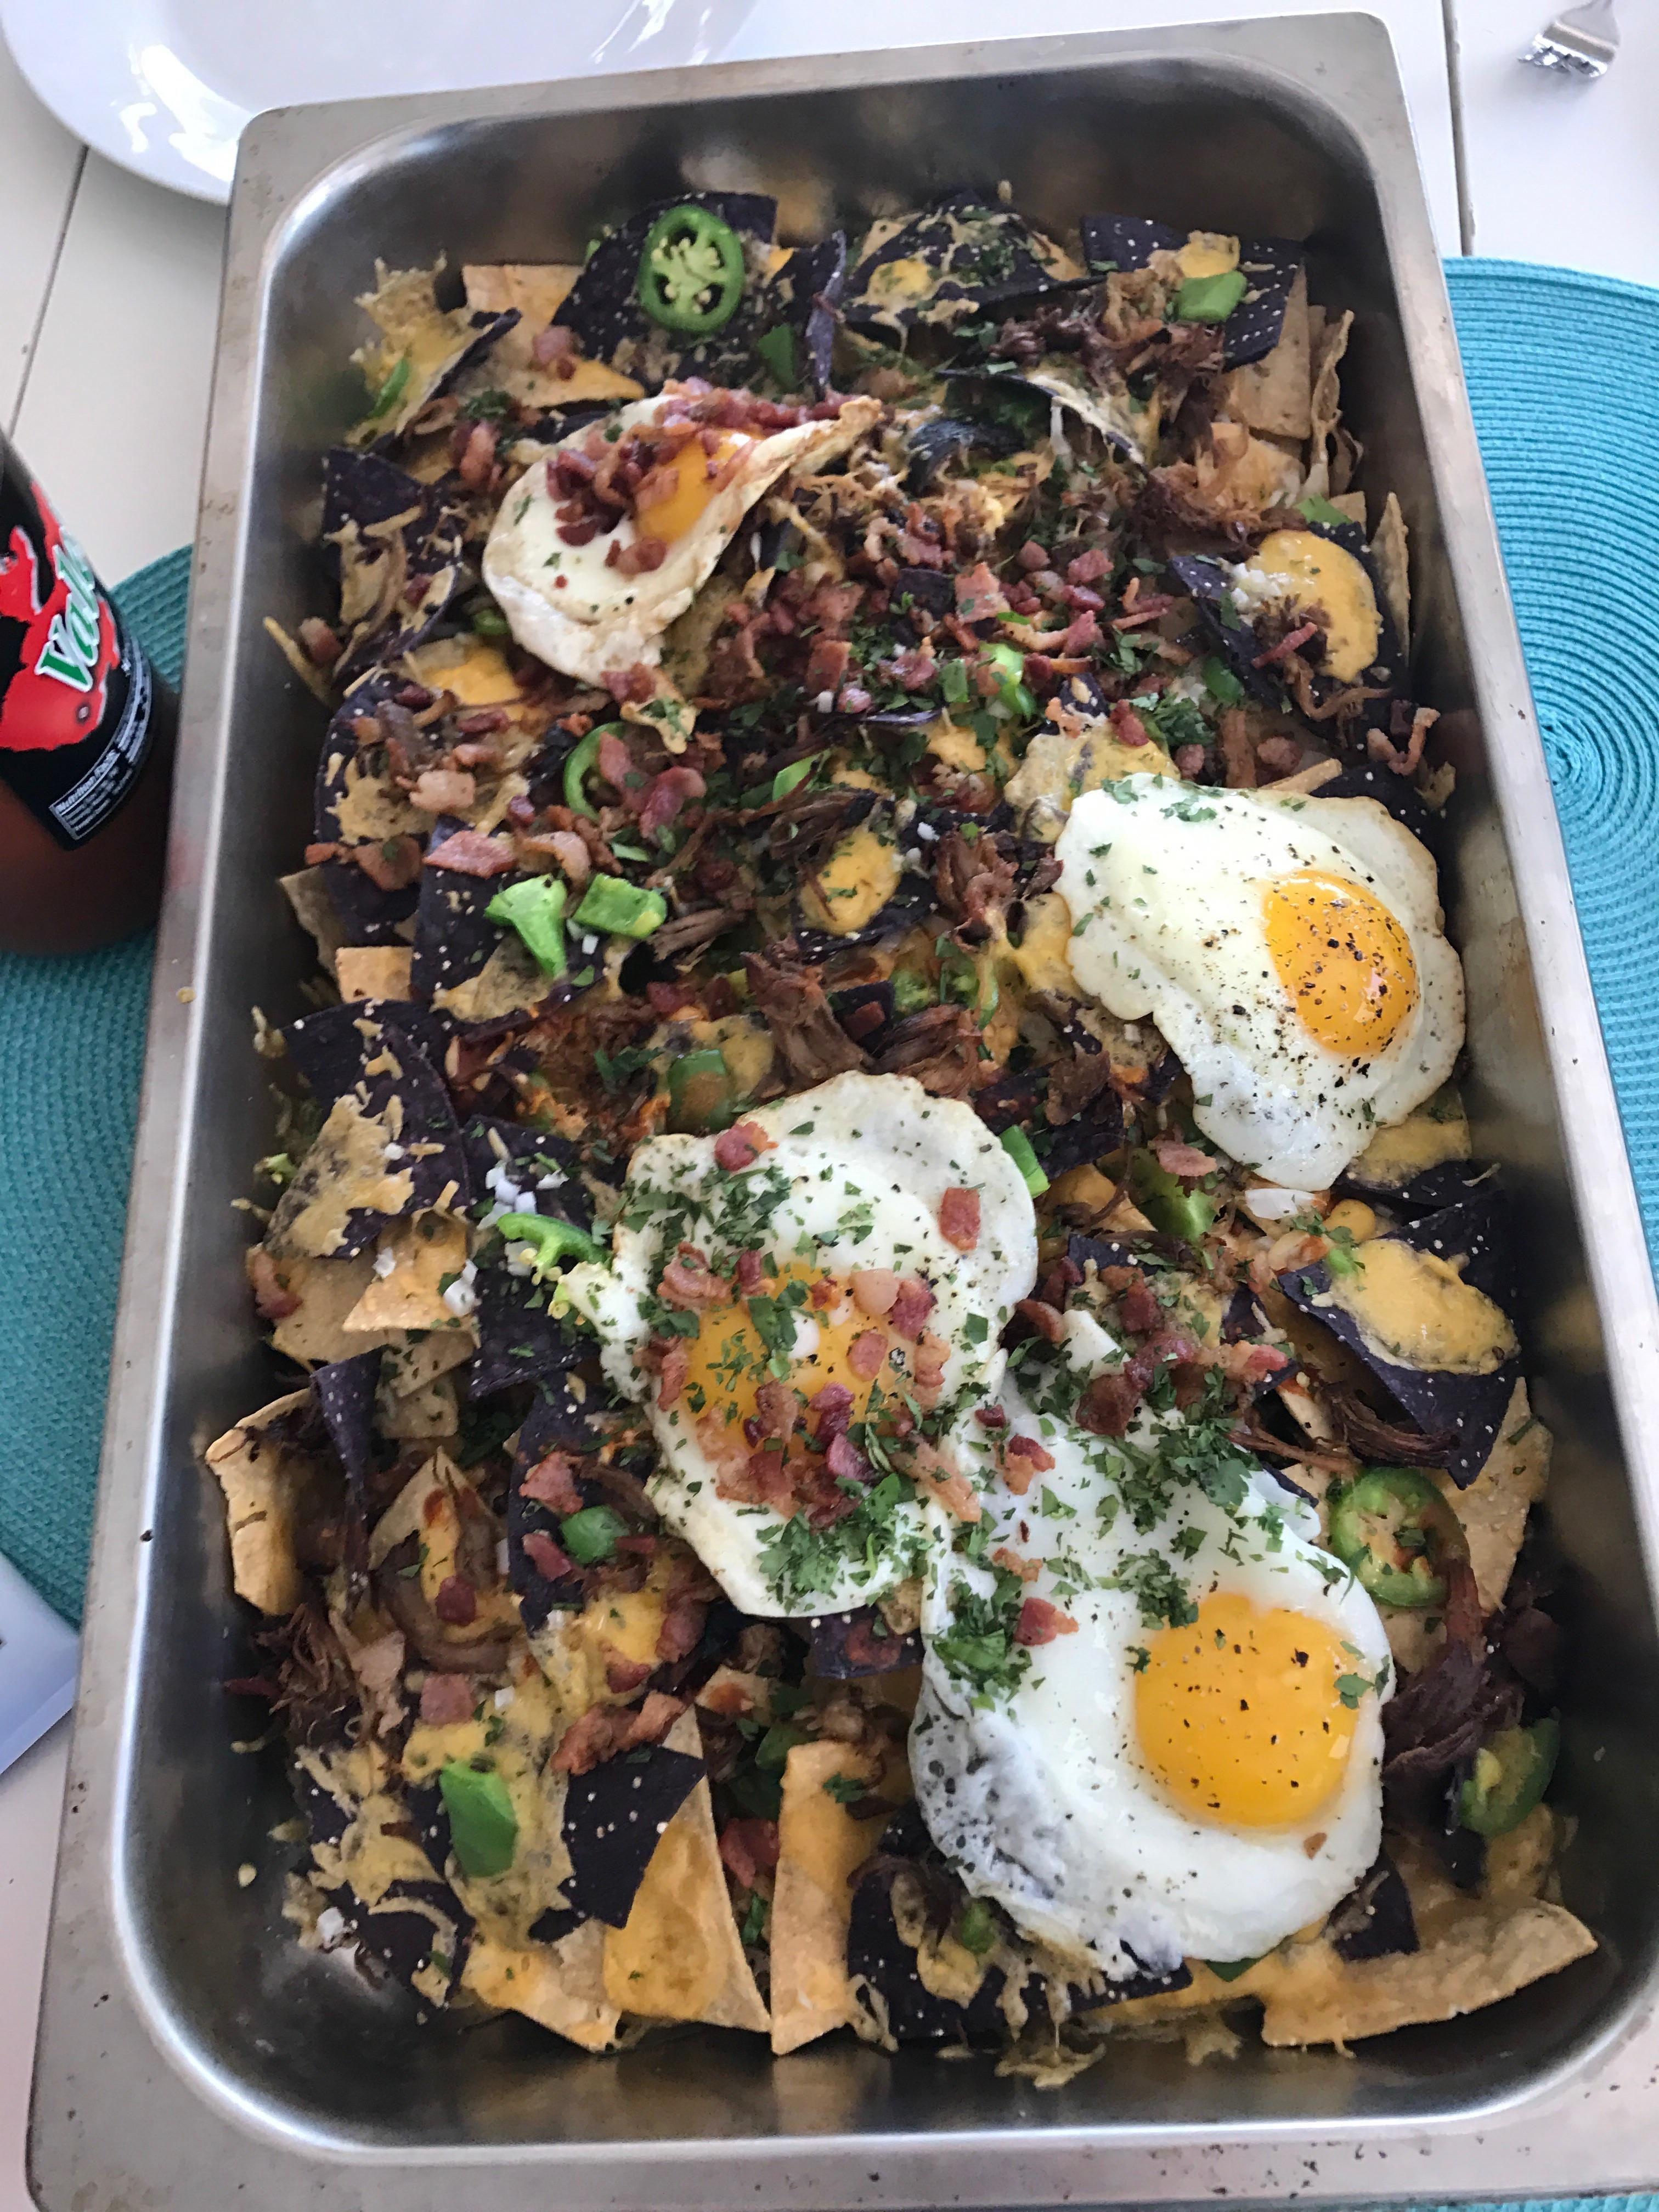 Breakfast nachos! [homemade]